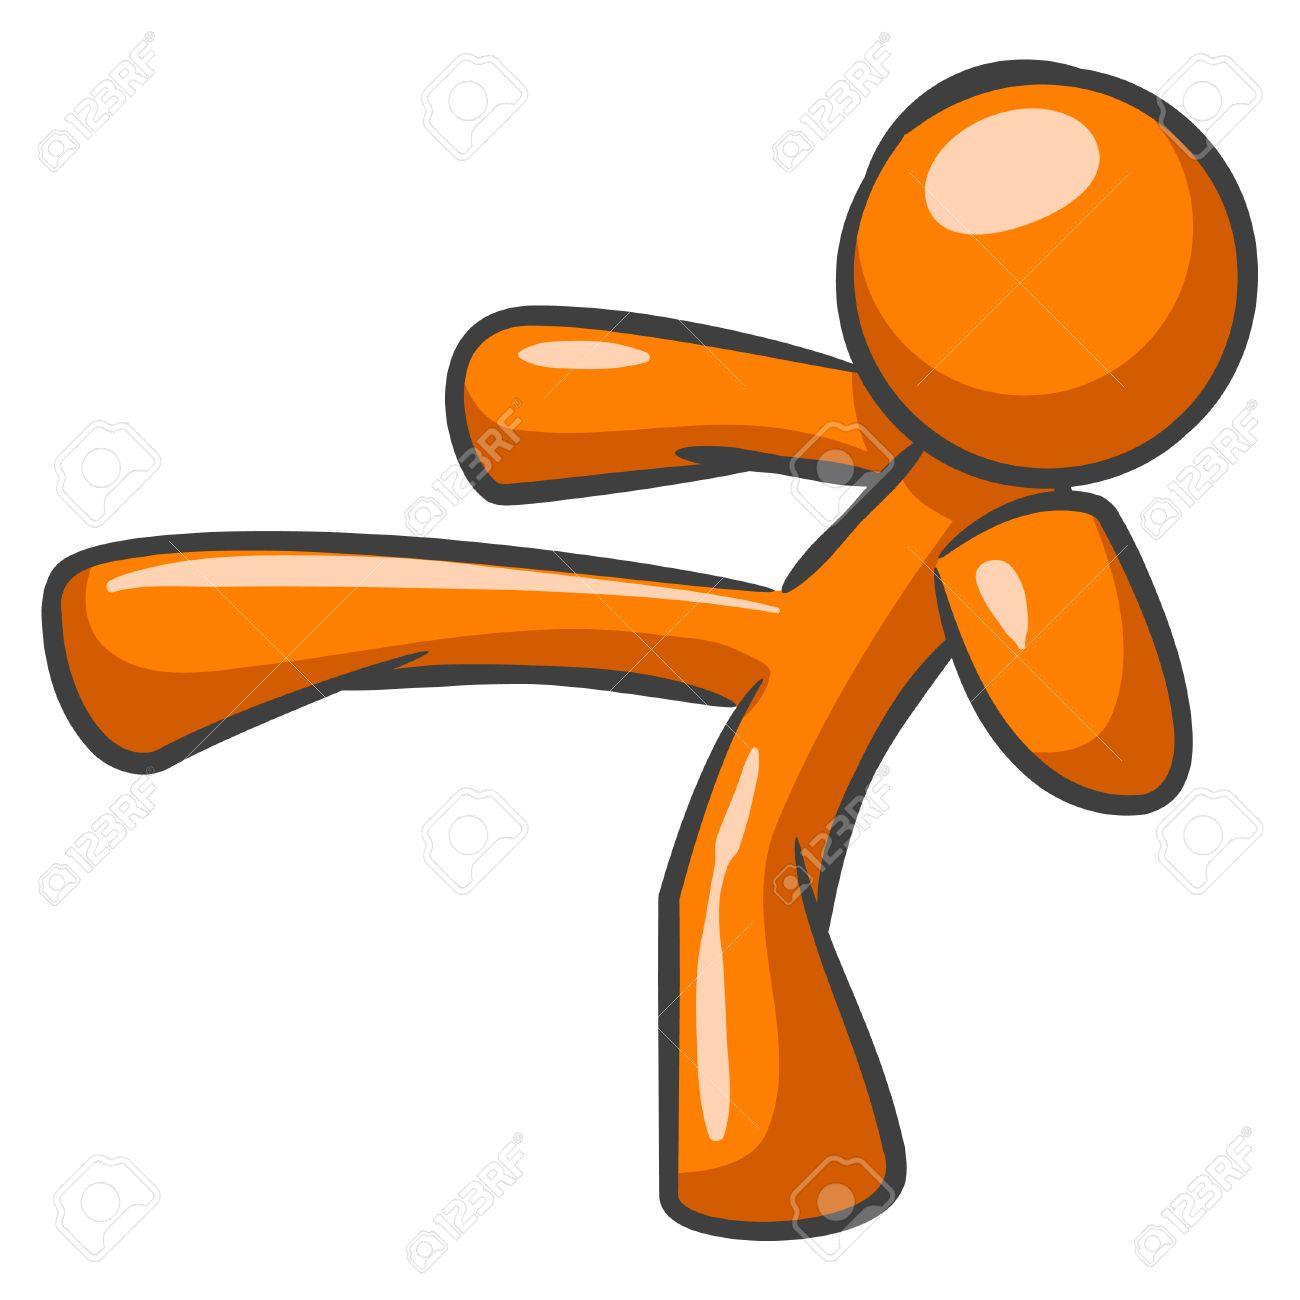 Orange Man Posed And Making A Karate Kick. Royalty Free Cliparts.